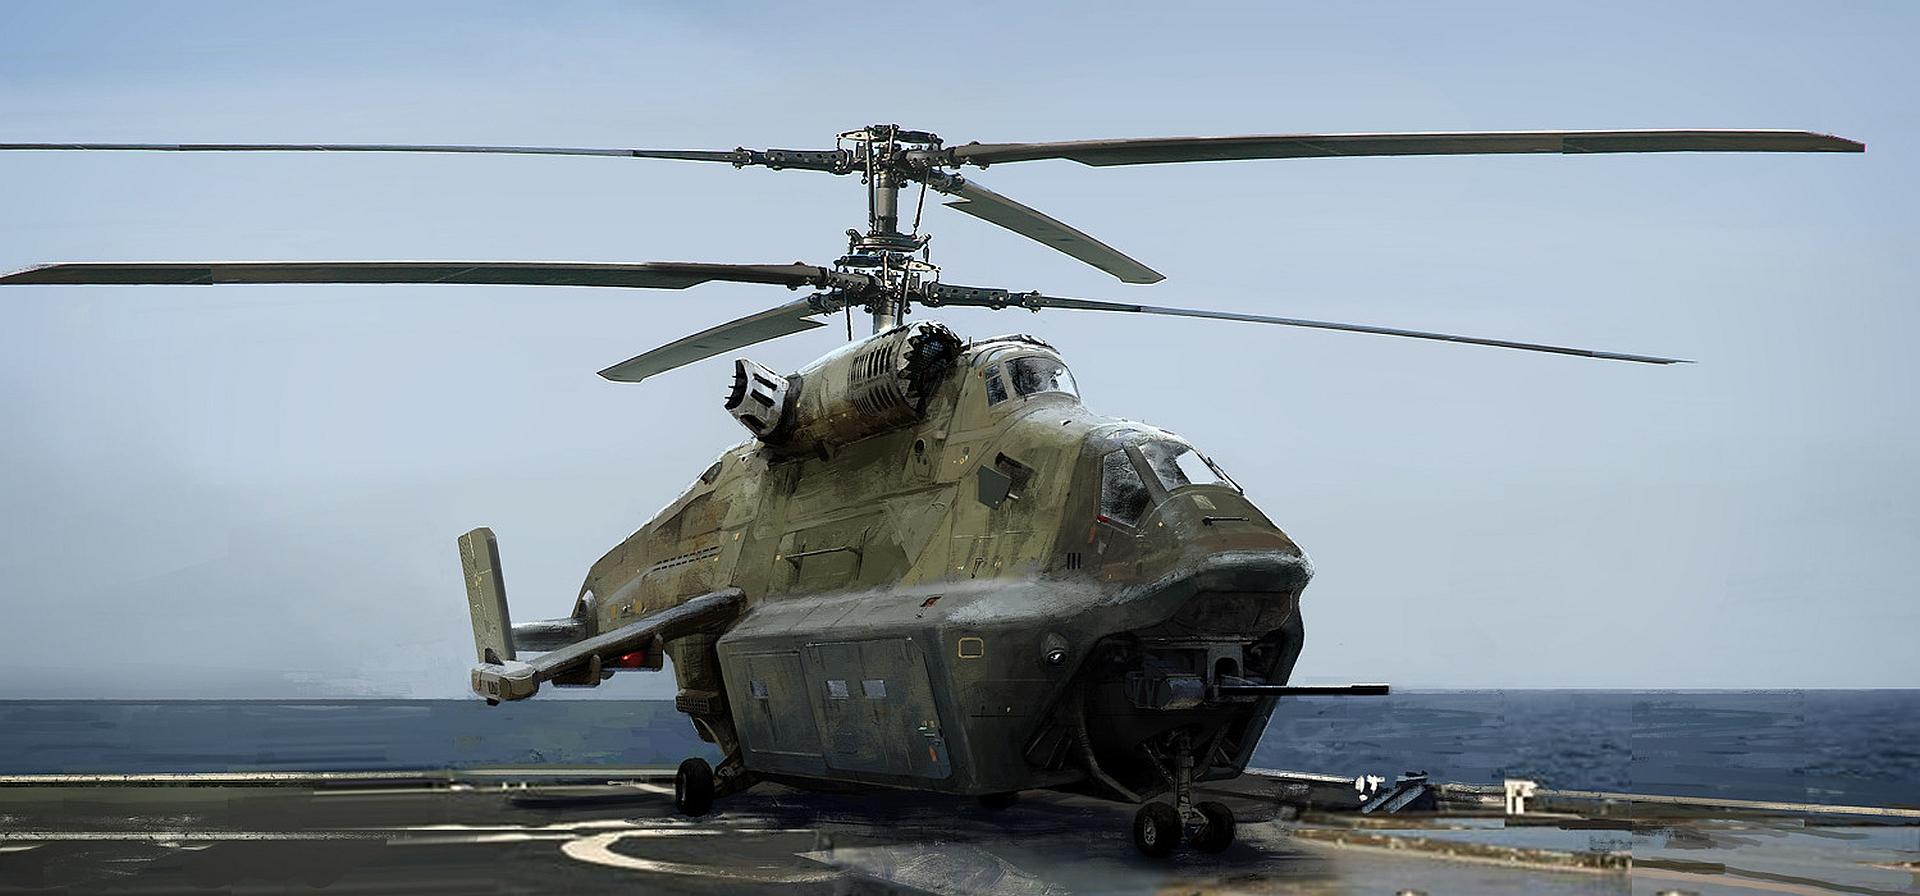 military helicopter wallpaper - wallpapersafari